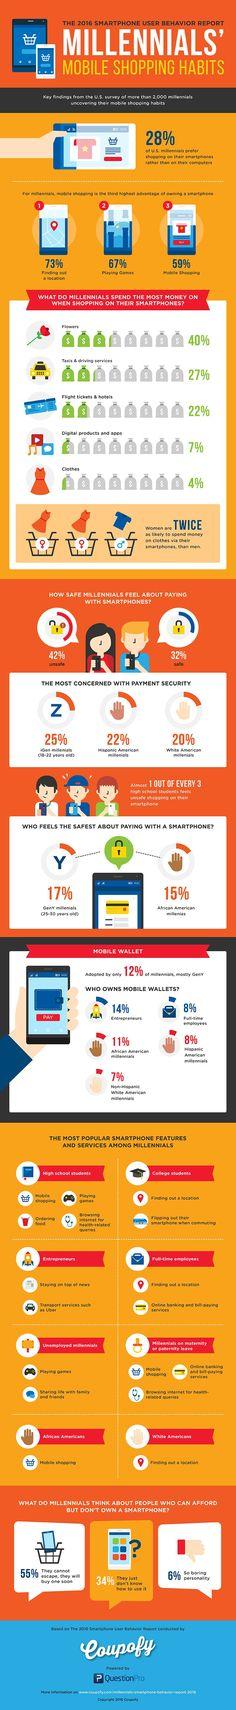 millennials mobile shopping habits